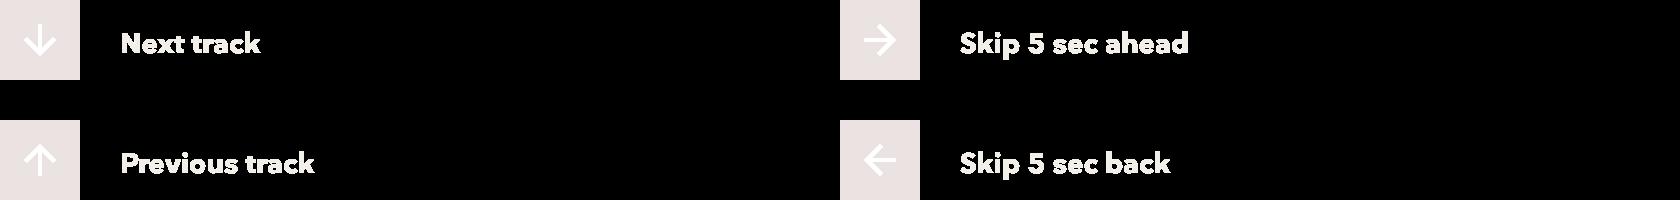 Keyboard Shortcuts Graphic